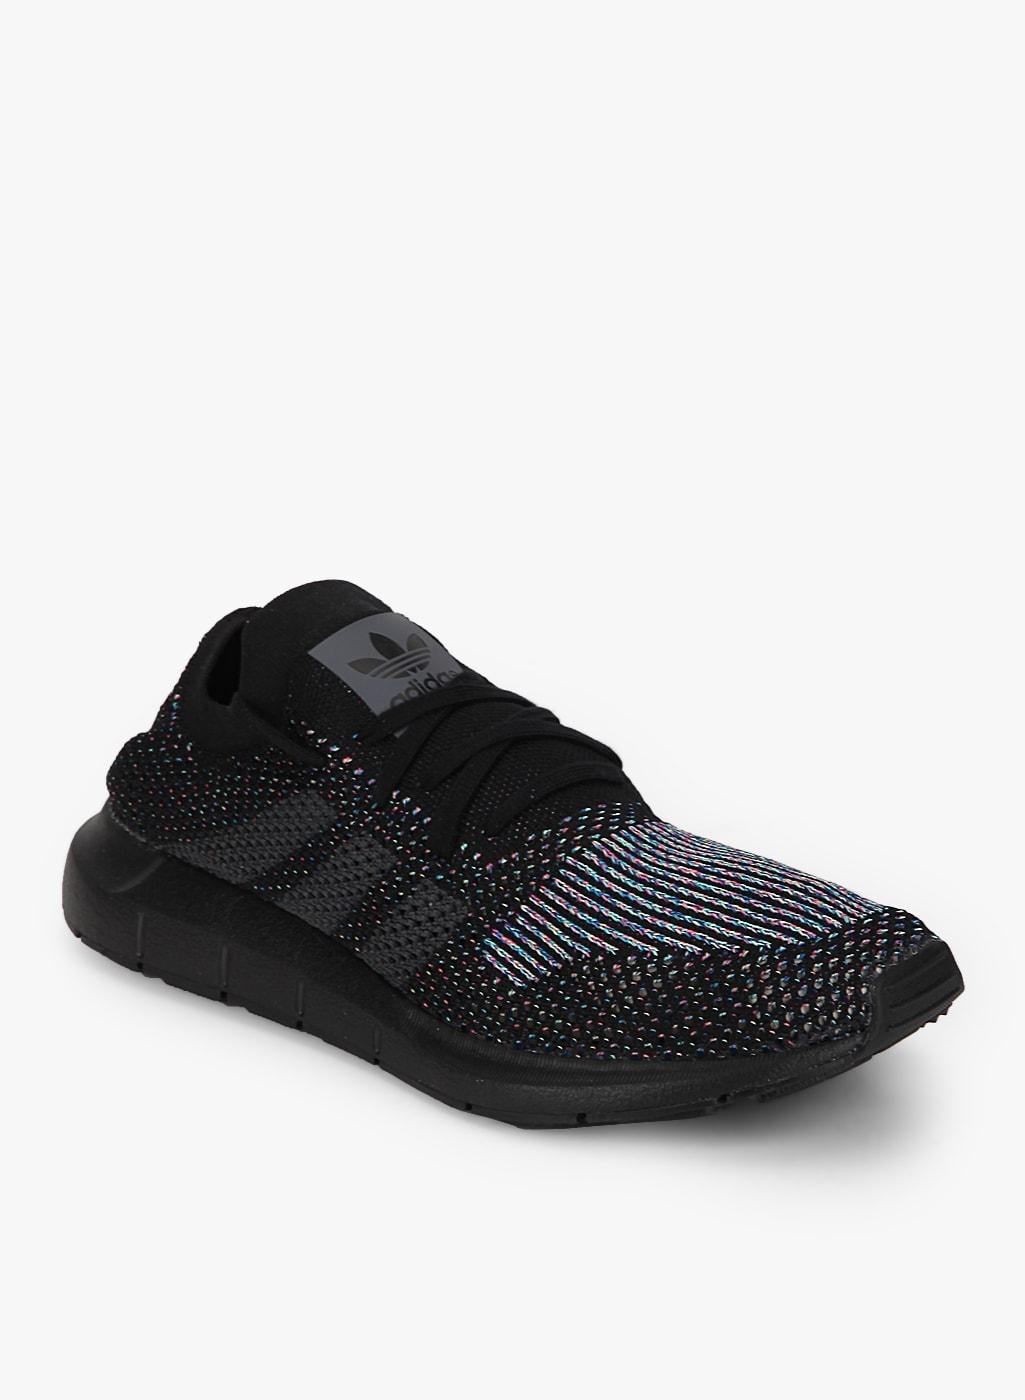 ADIDAS Originals Swift Run Pk Black Sneakers